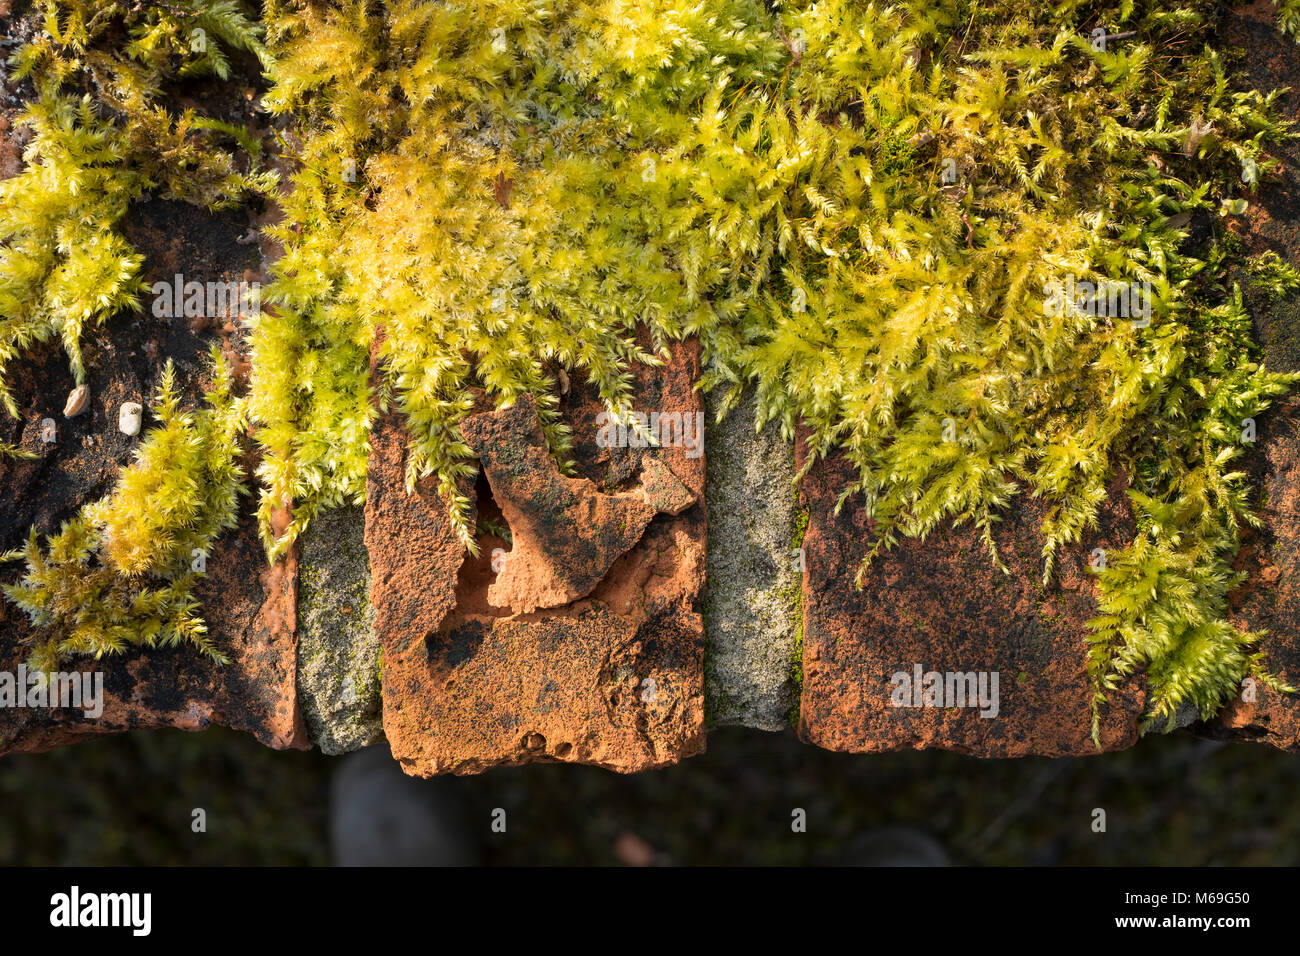 Modern Moss Wall Decor Adornment - Gallery Wall Art - factografia.com